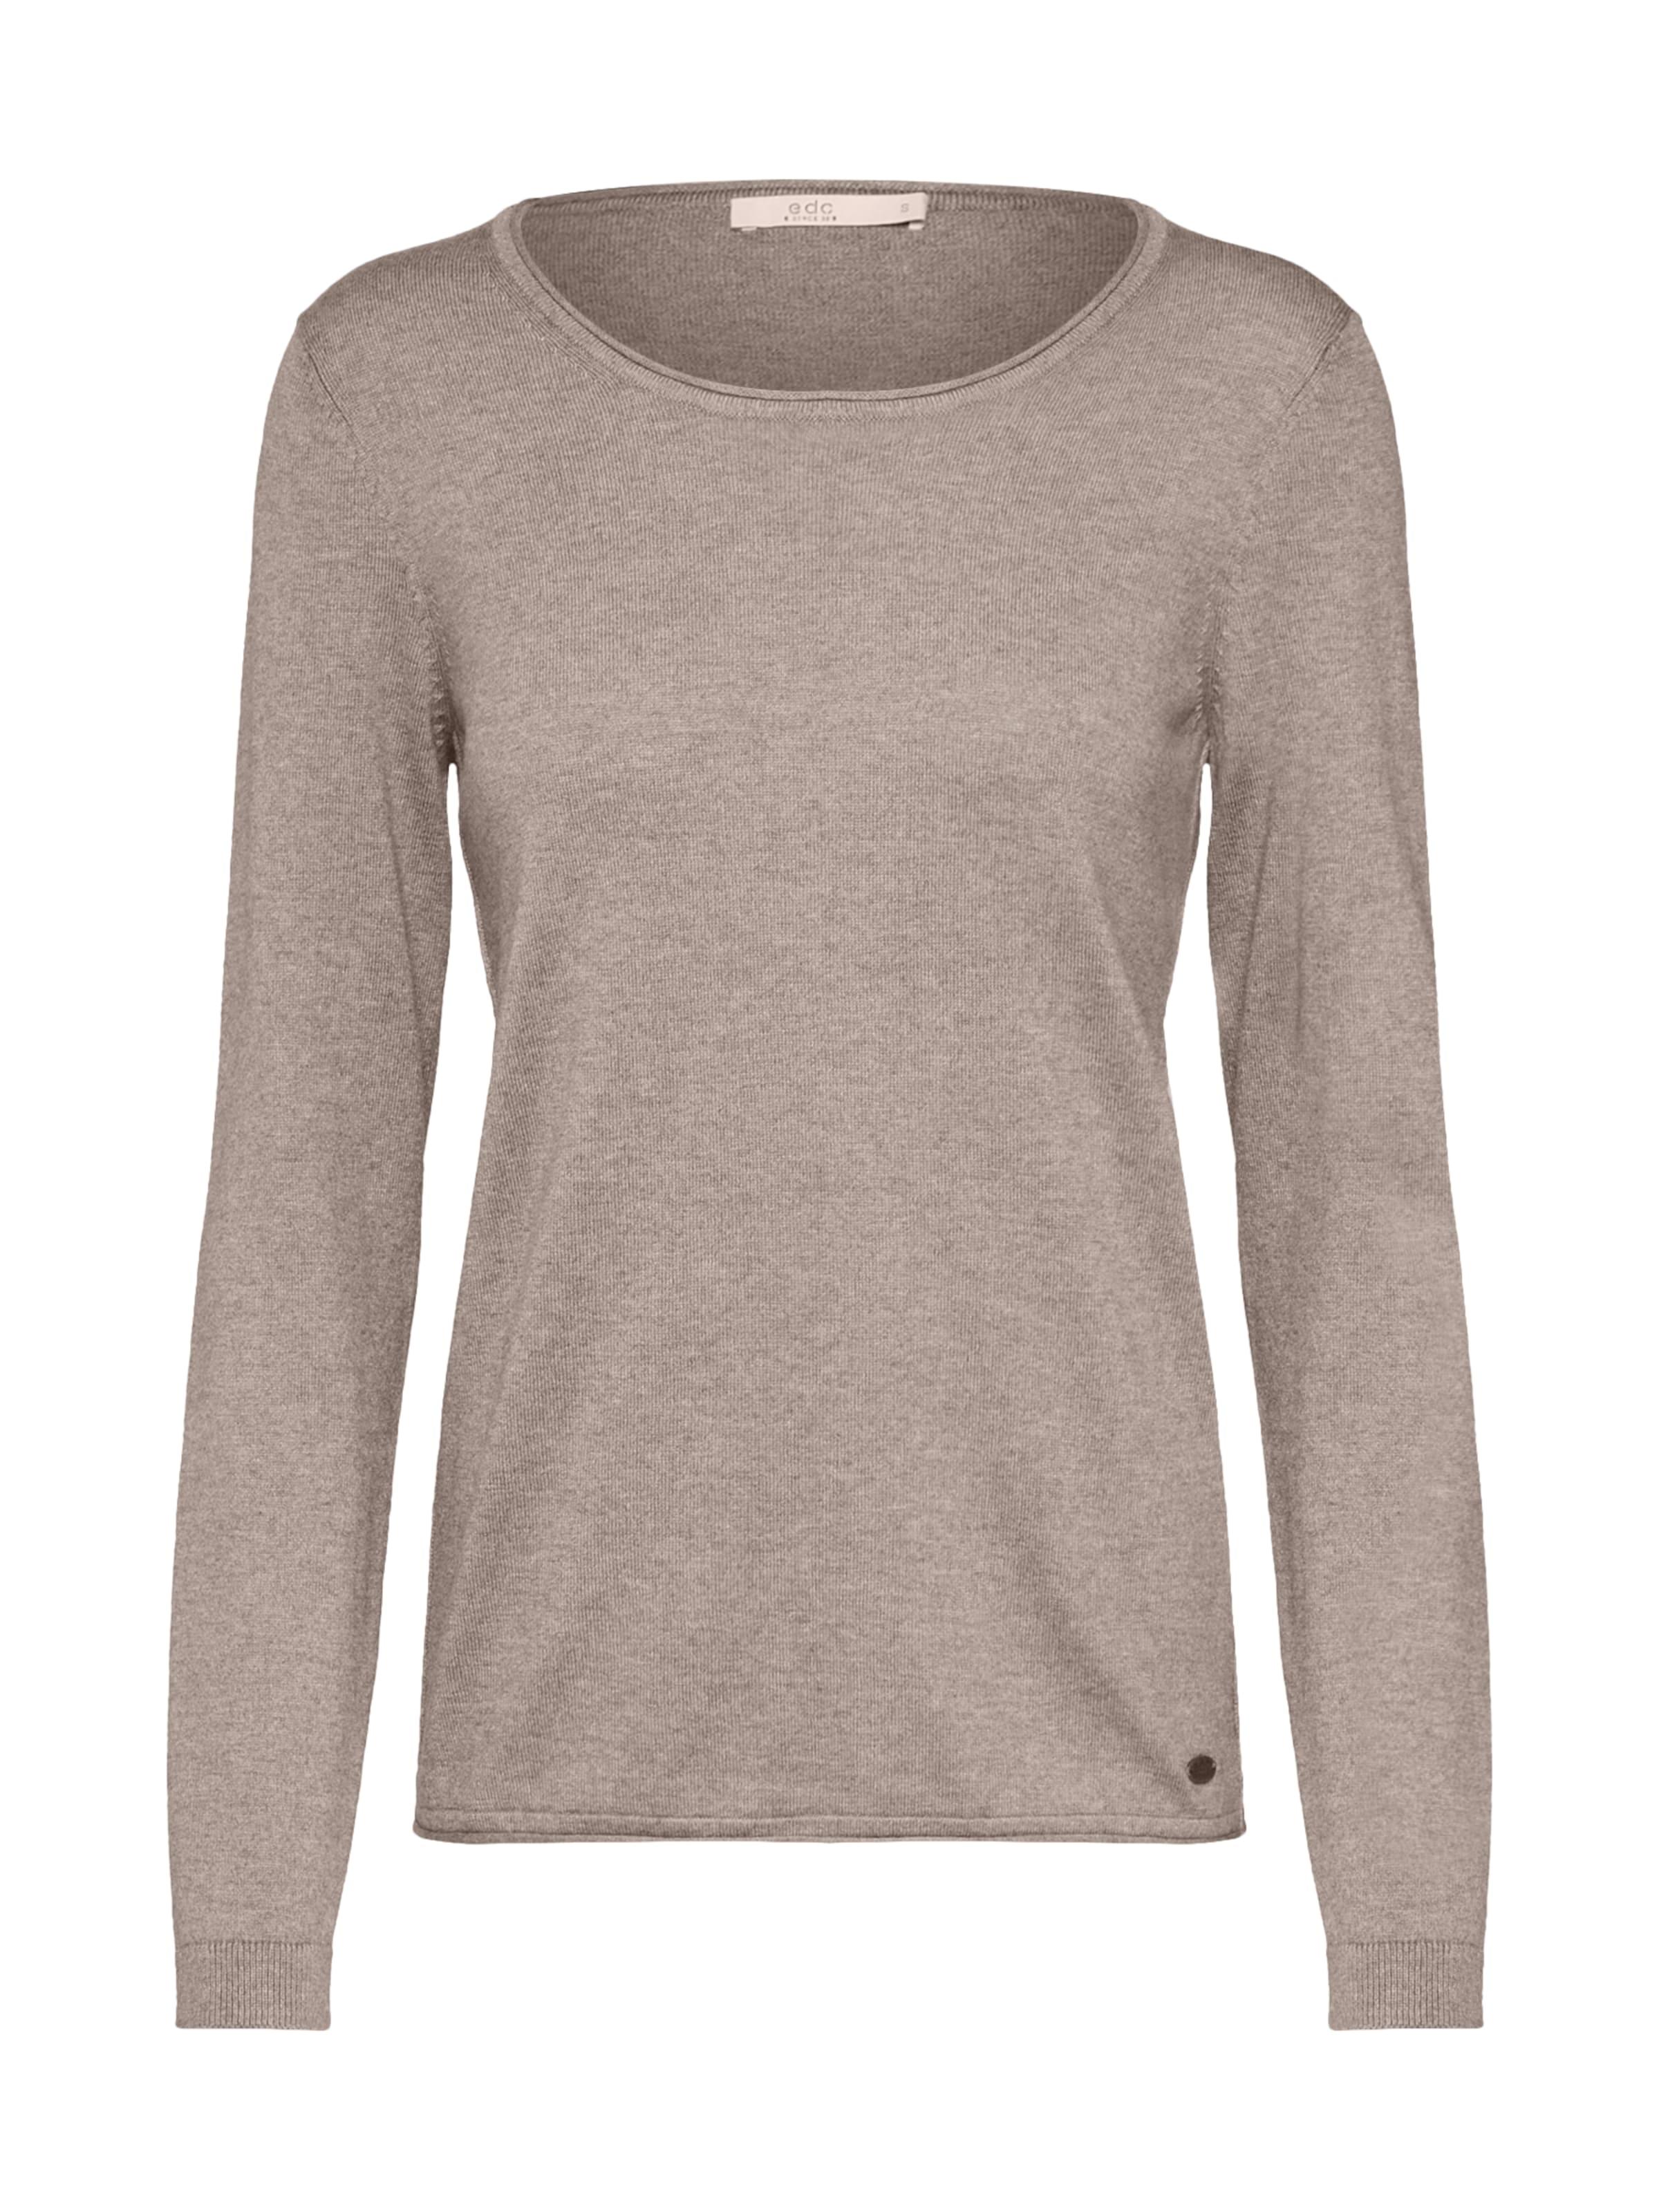 By Taupe Esprit 'ocs' In Edc Shirt K5l1cT3uFJ